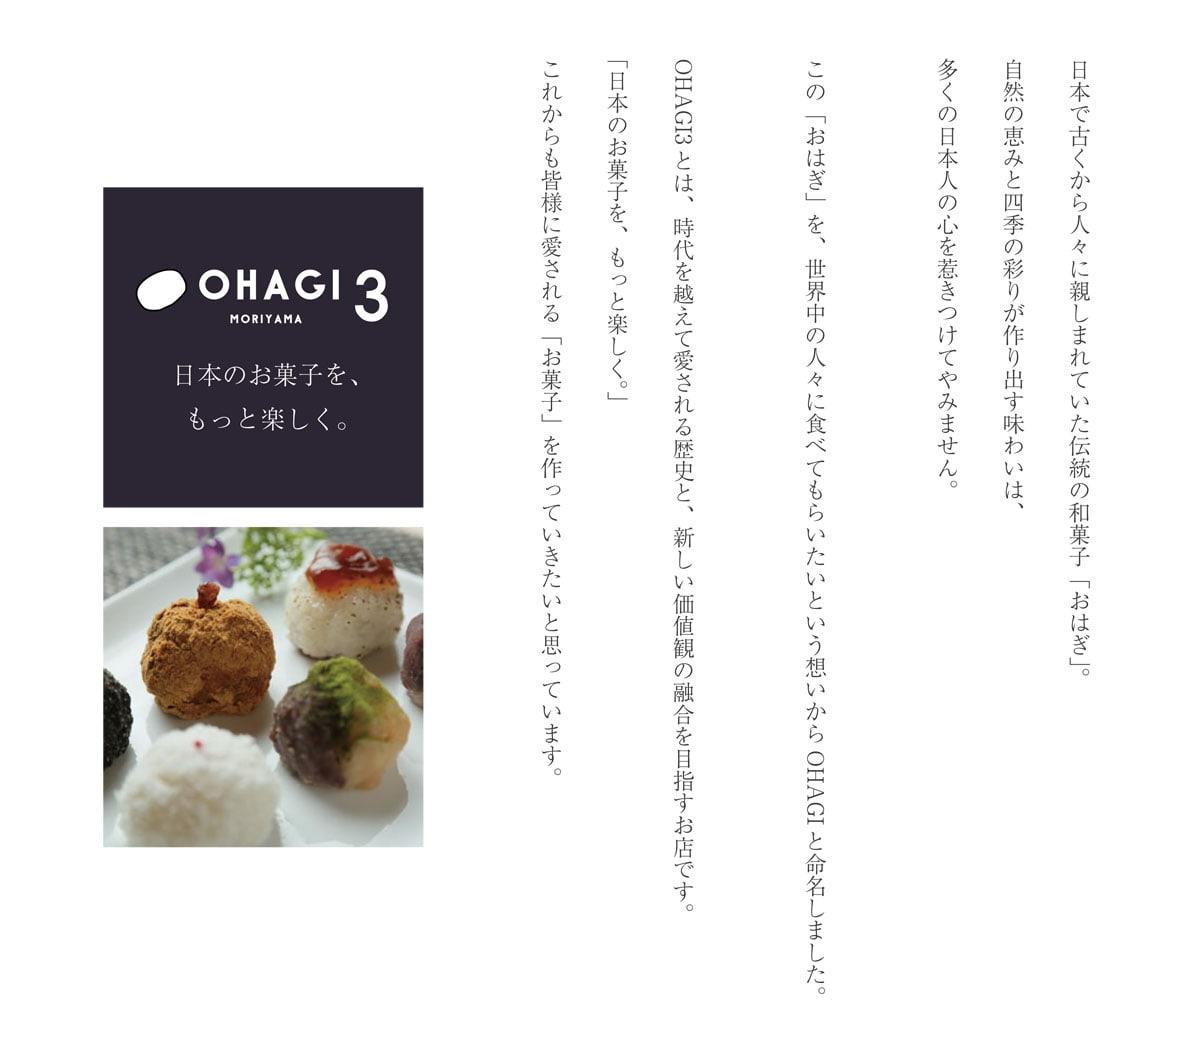 OHAGI3のコンセプト